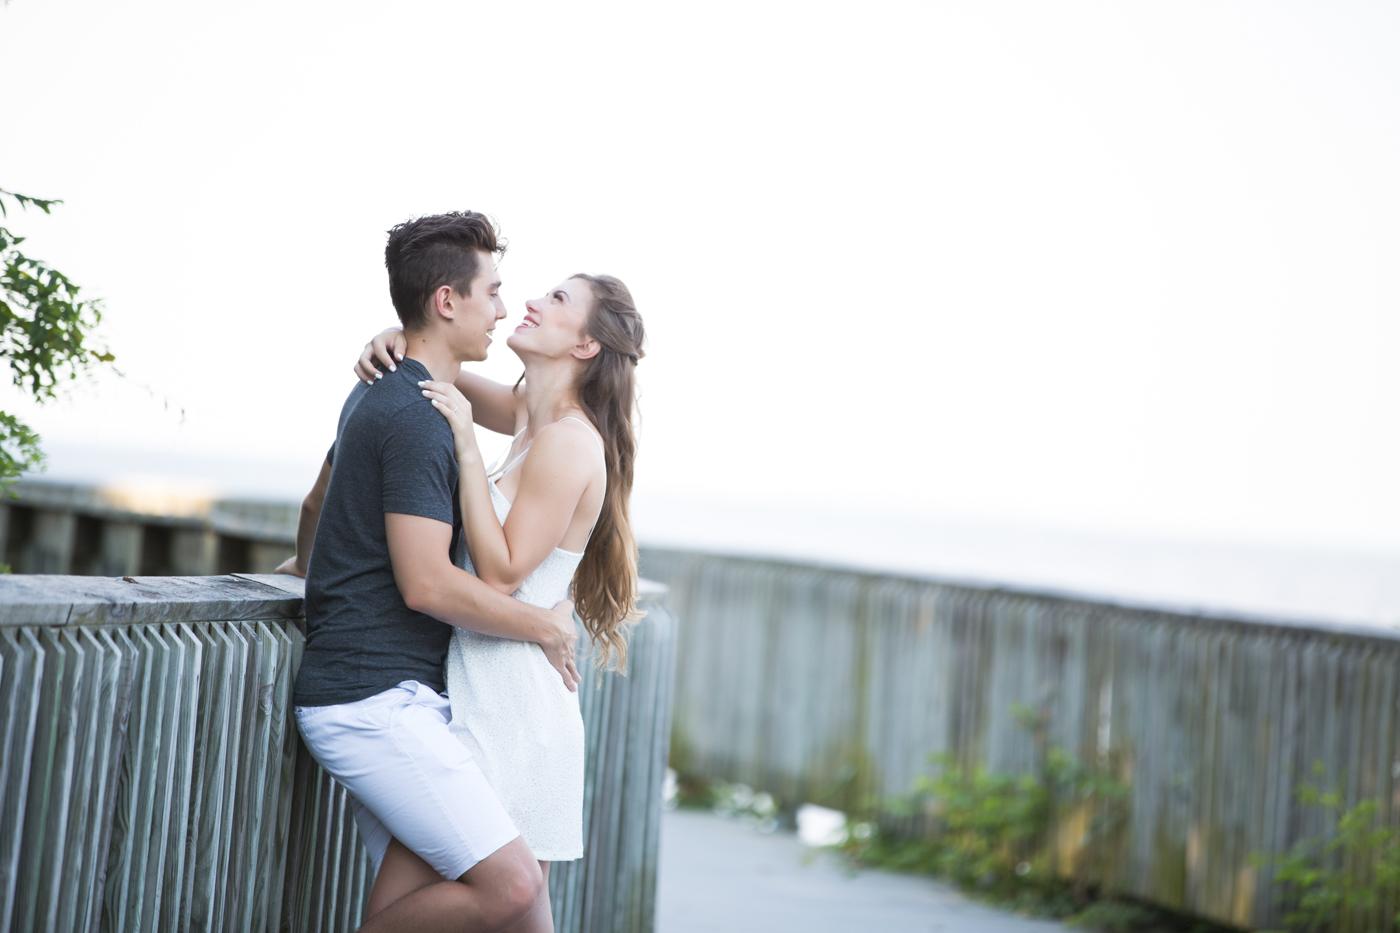 summer-beach-engagement-shoot-ksenia-pro-photography-14